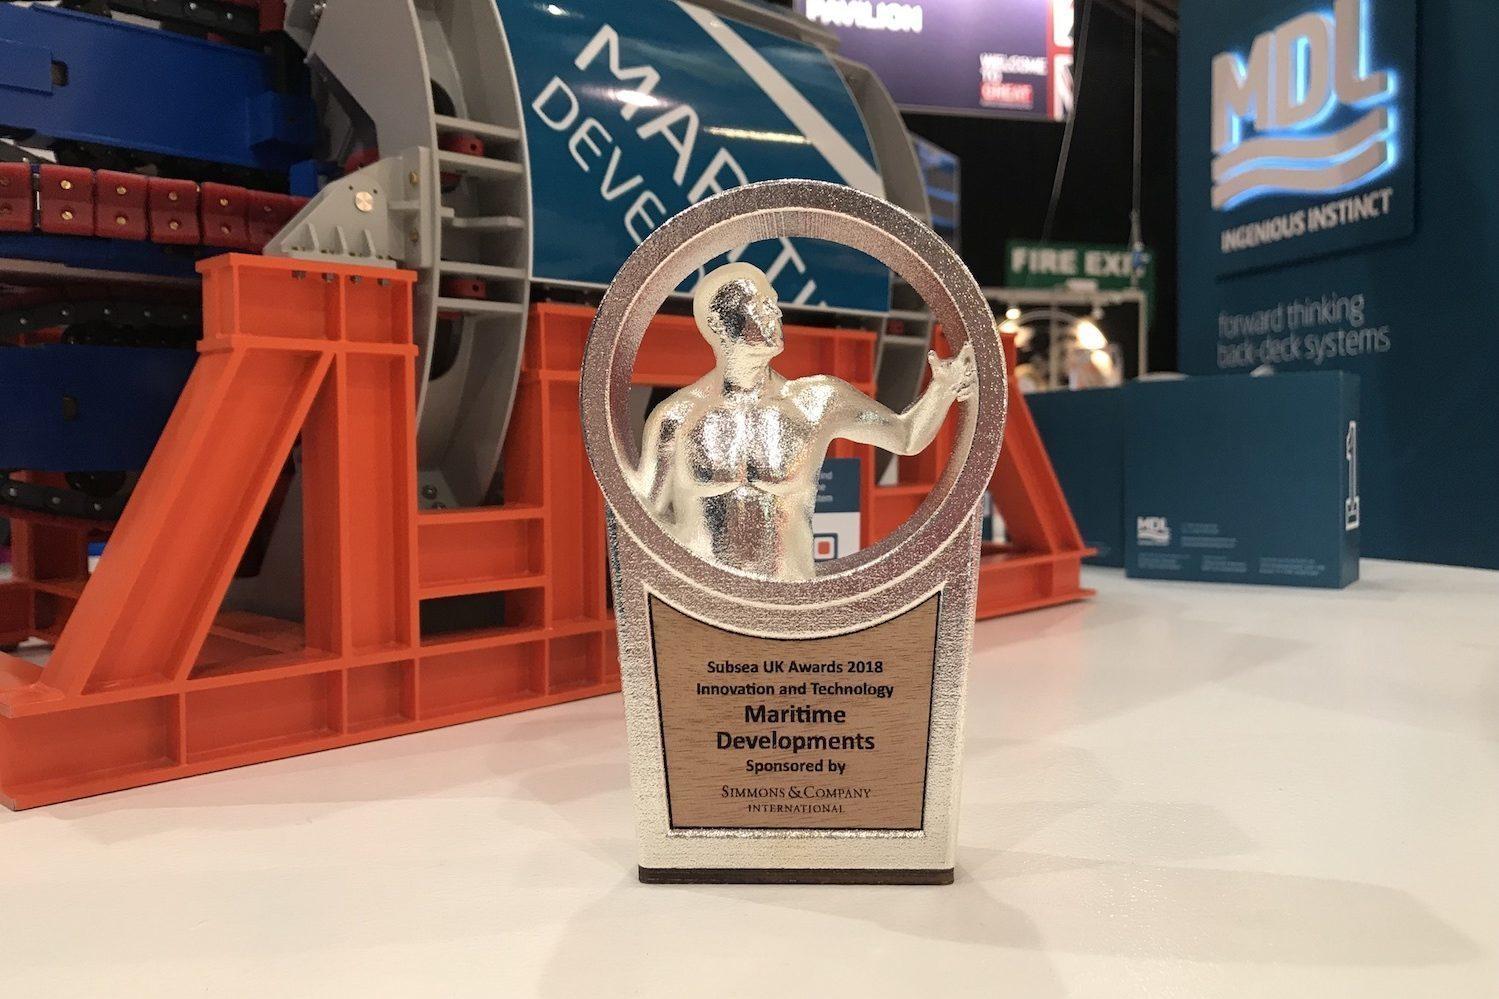 MDL Innovation & Technology Award